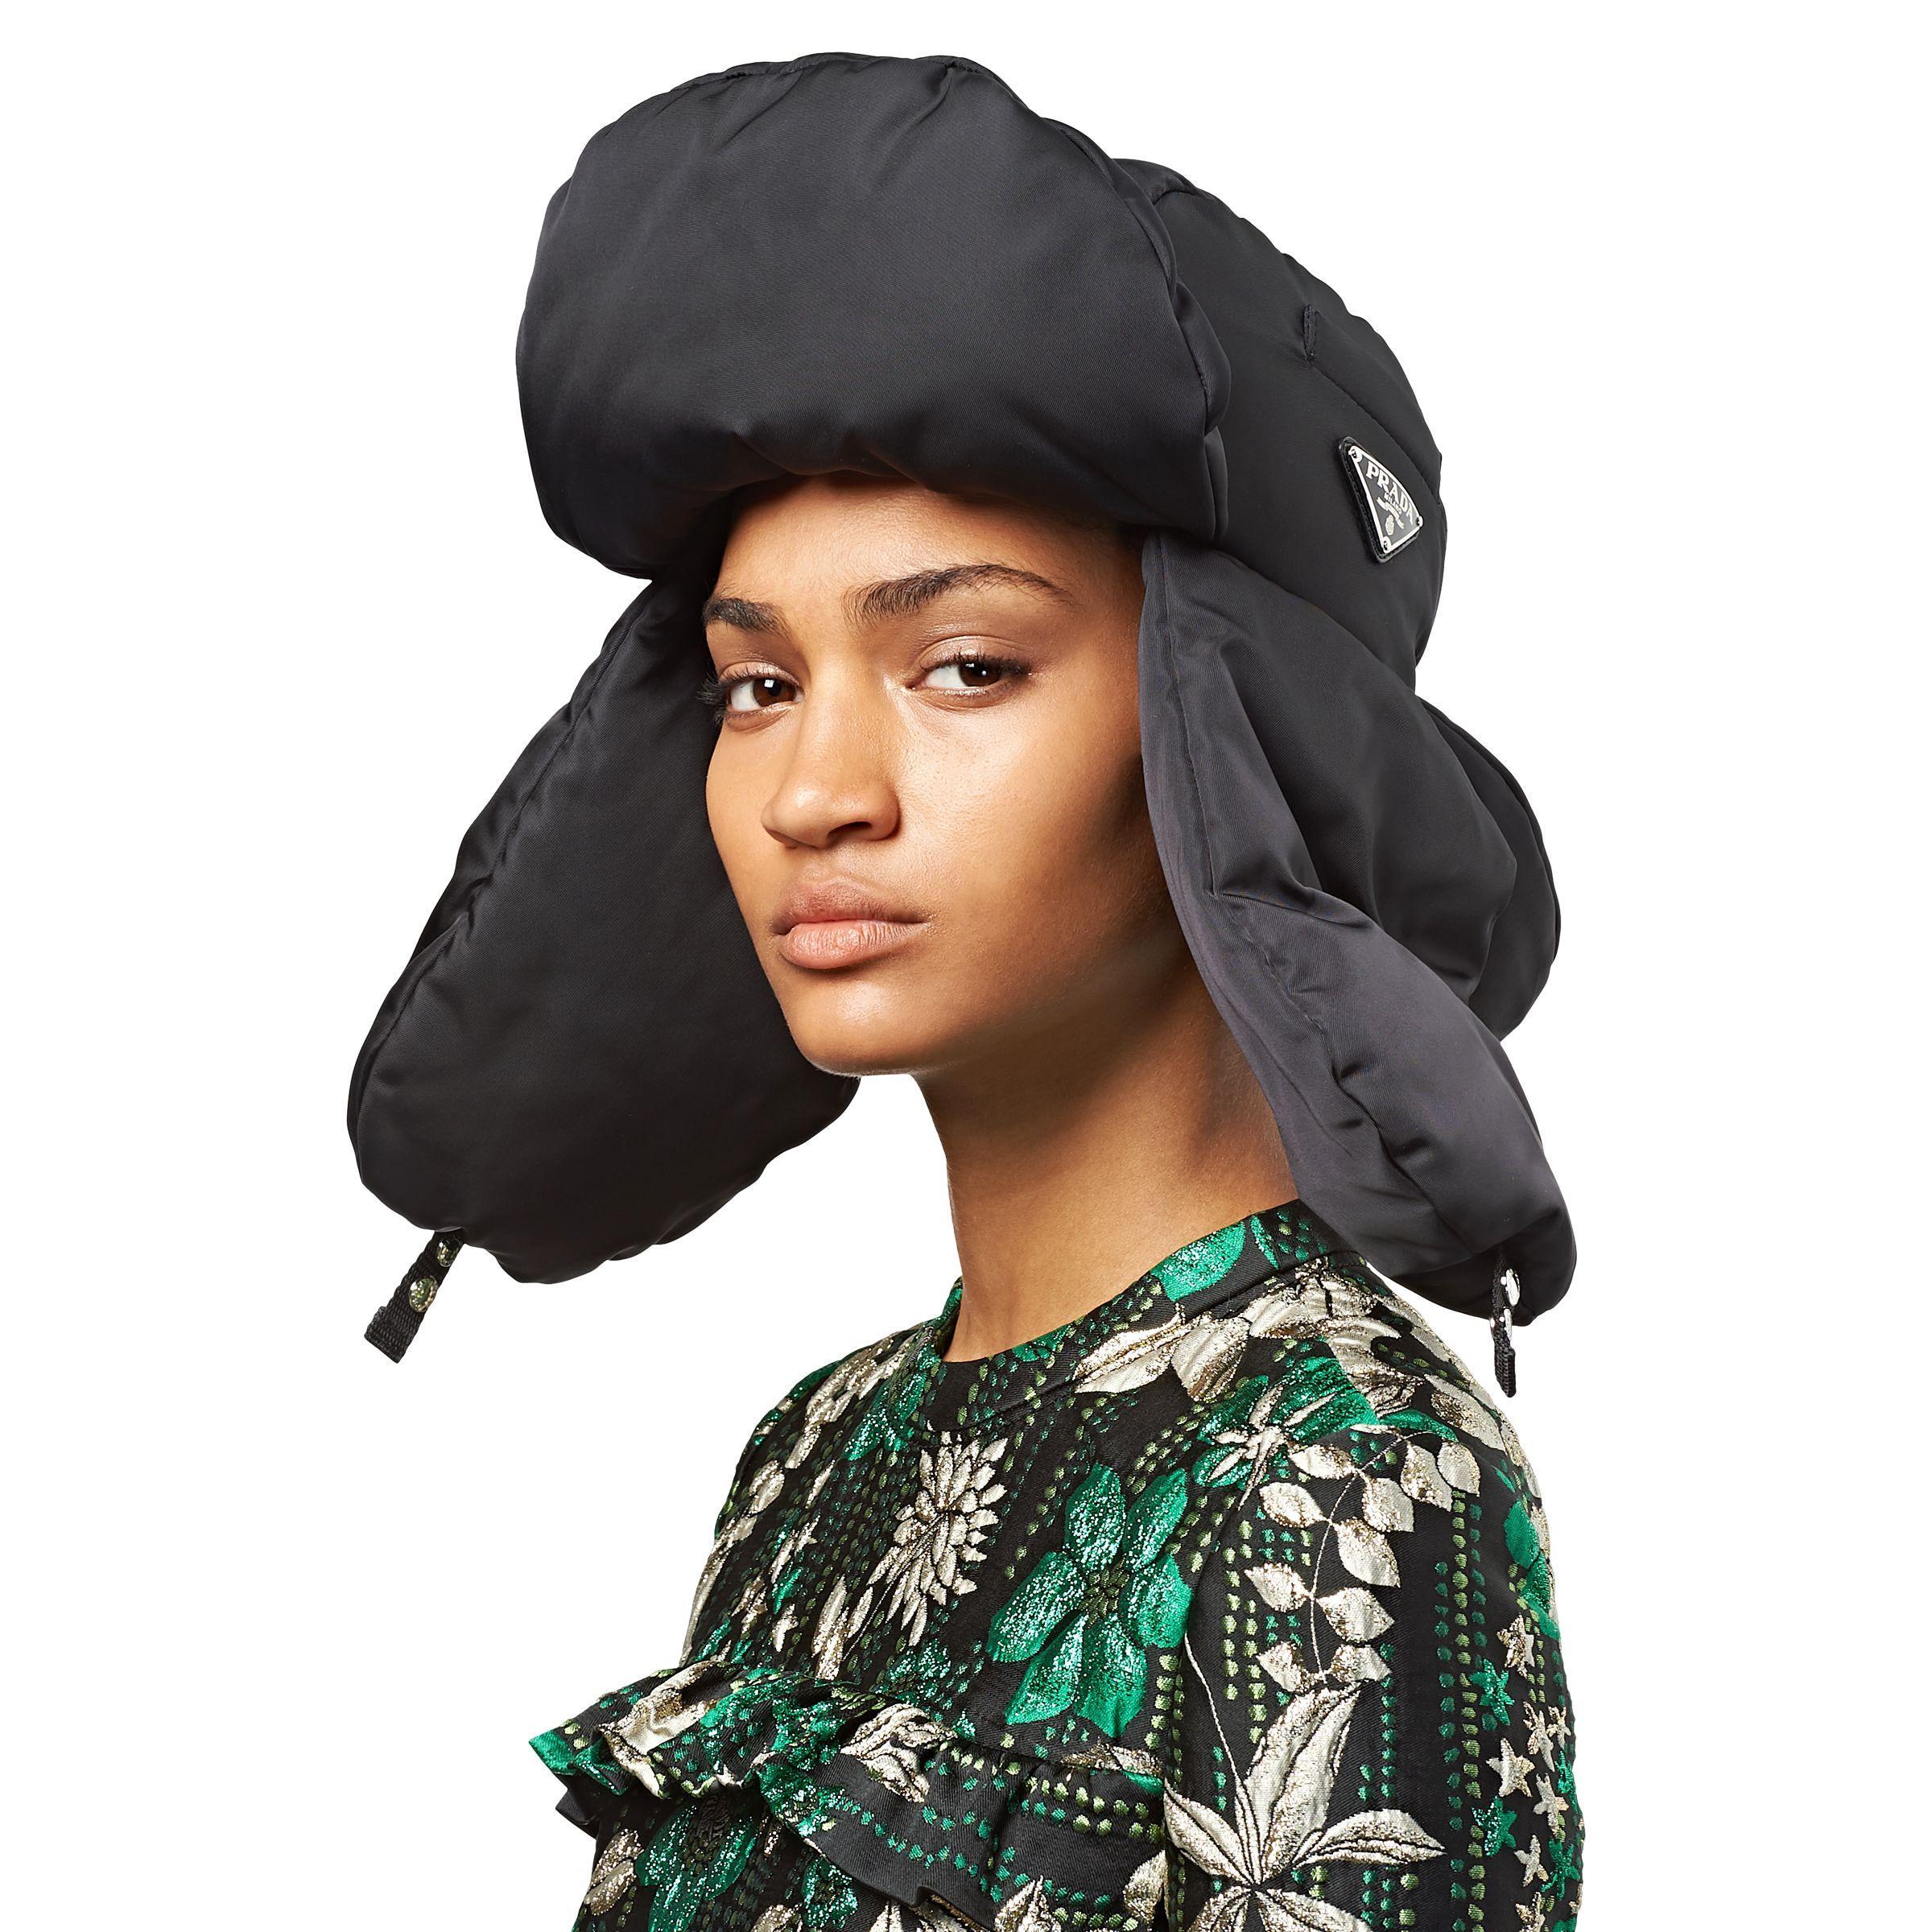 Lyst - Prada Padded Trapper Hat in Black 6267c0fa1d3f